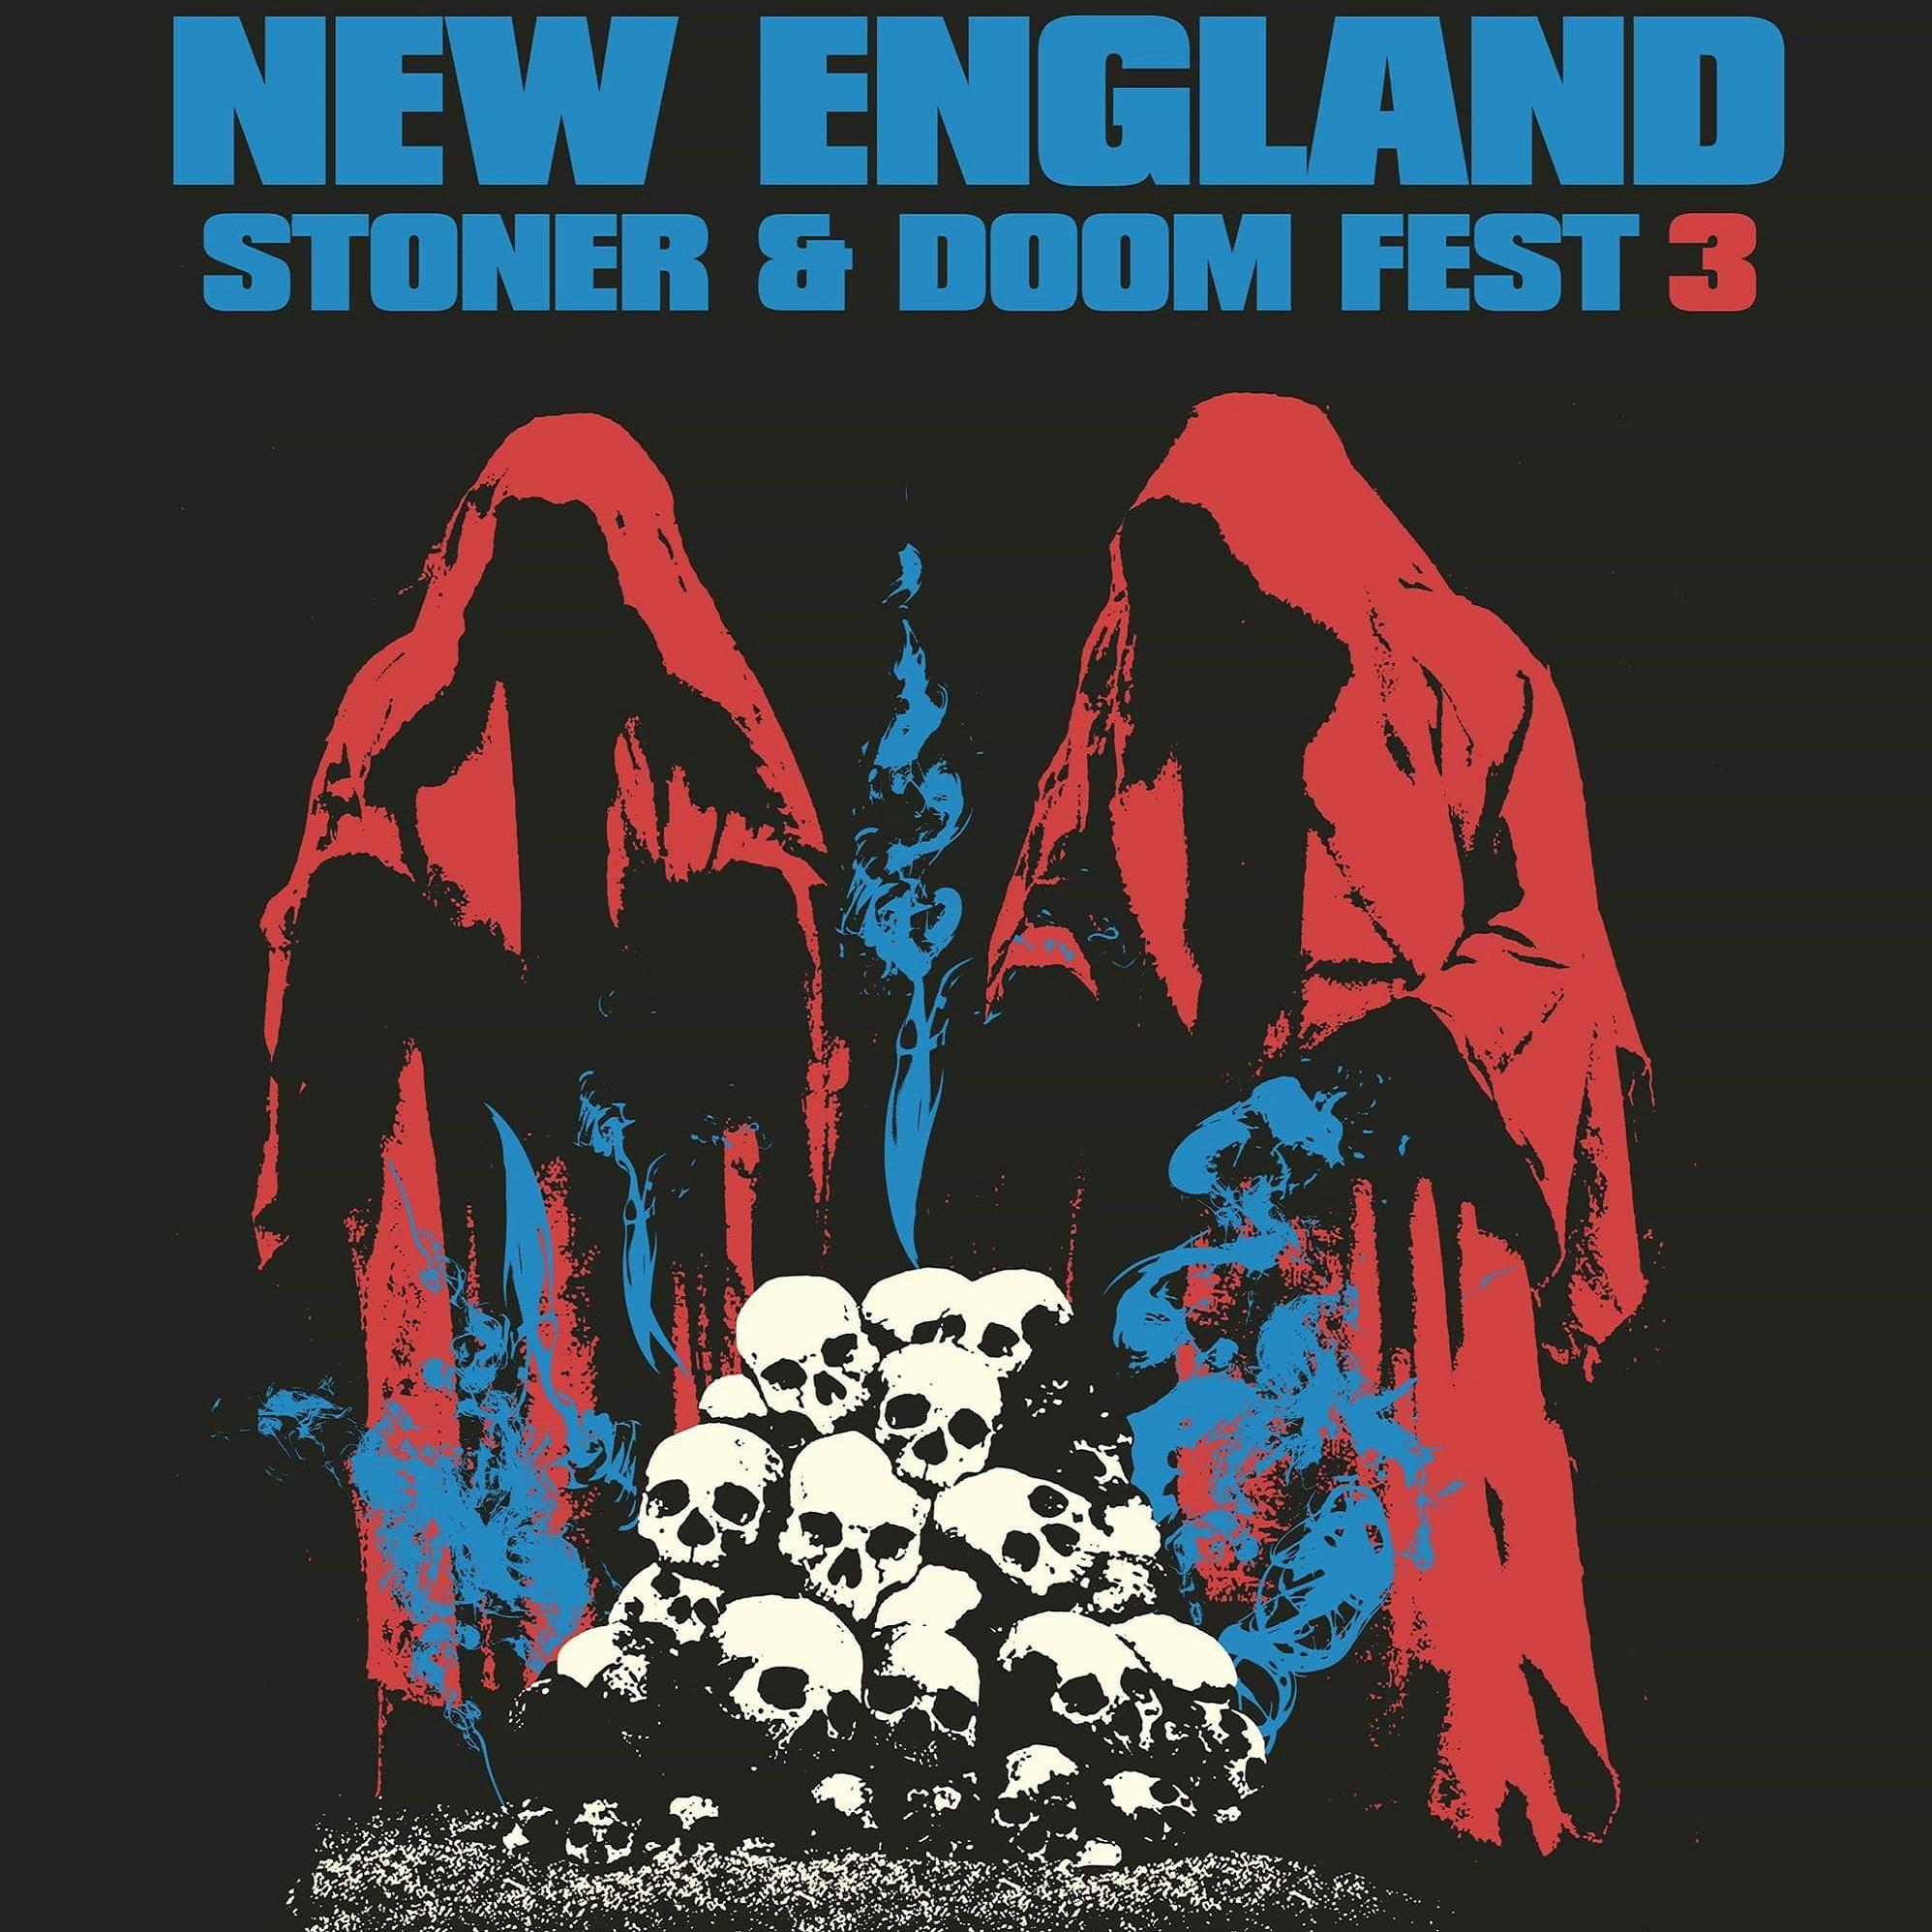 new england stoner doom festival 3 logo